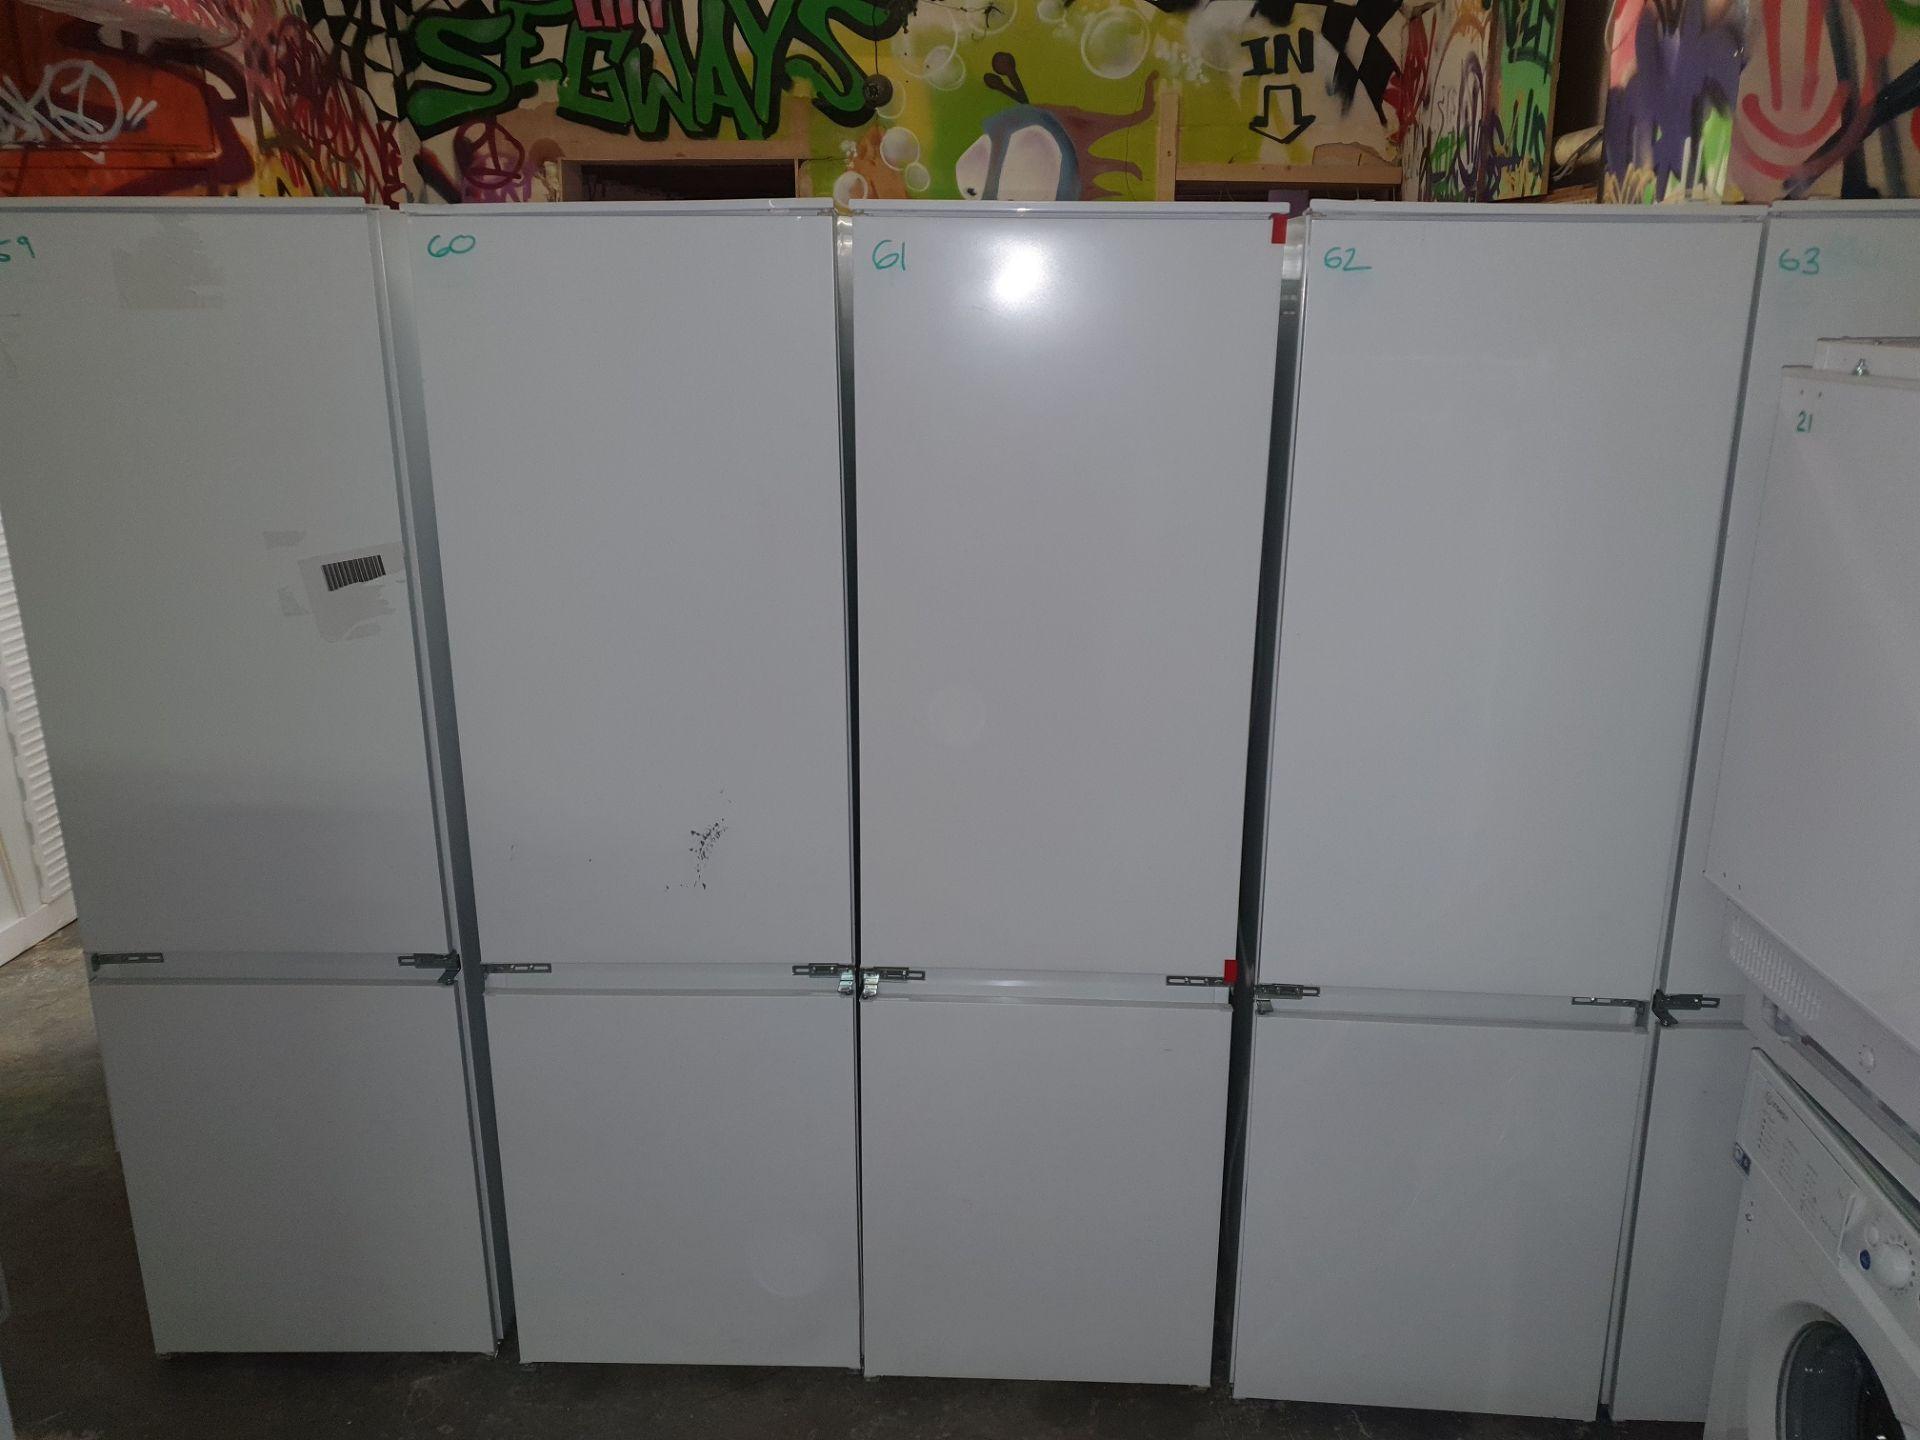 NEW/GRADED AND UNPACKAGED Prima PRRF702 Integrated Fridge Freezer (Brand new slight external - Image 2 of 14